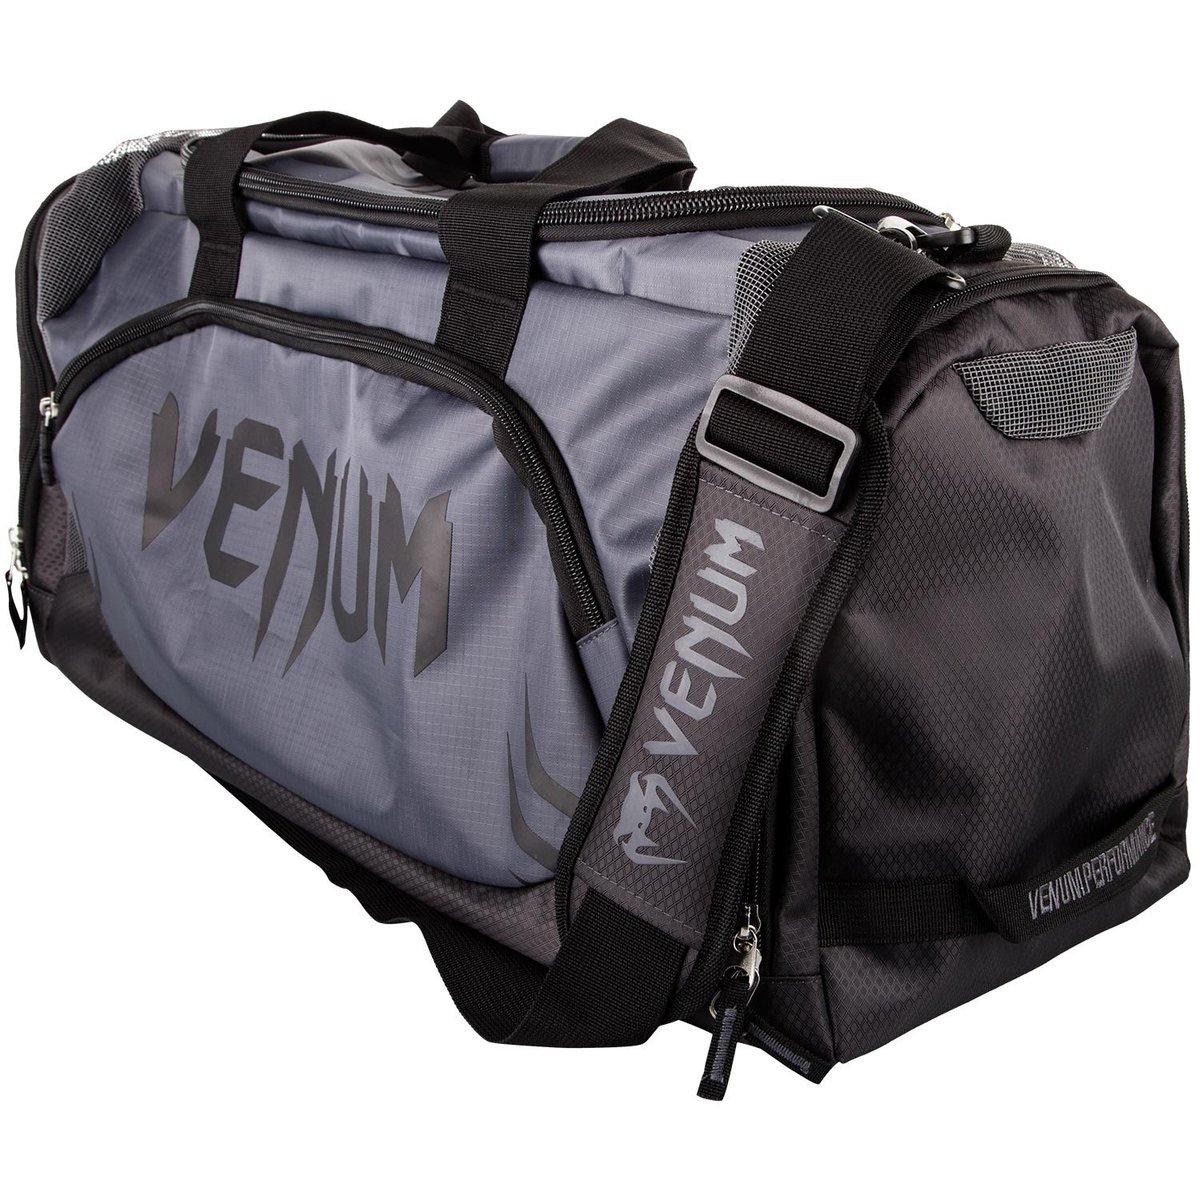 taška VENUM - Trainer Lite Sport - Grey/Grey - VENUM-2123-432